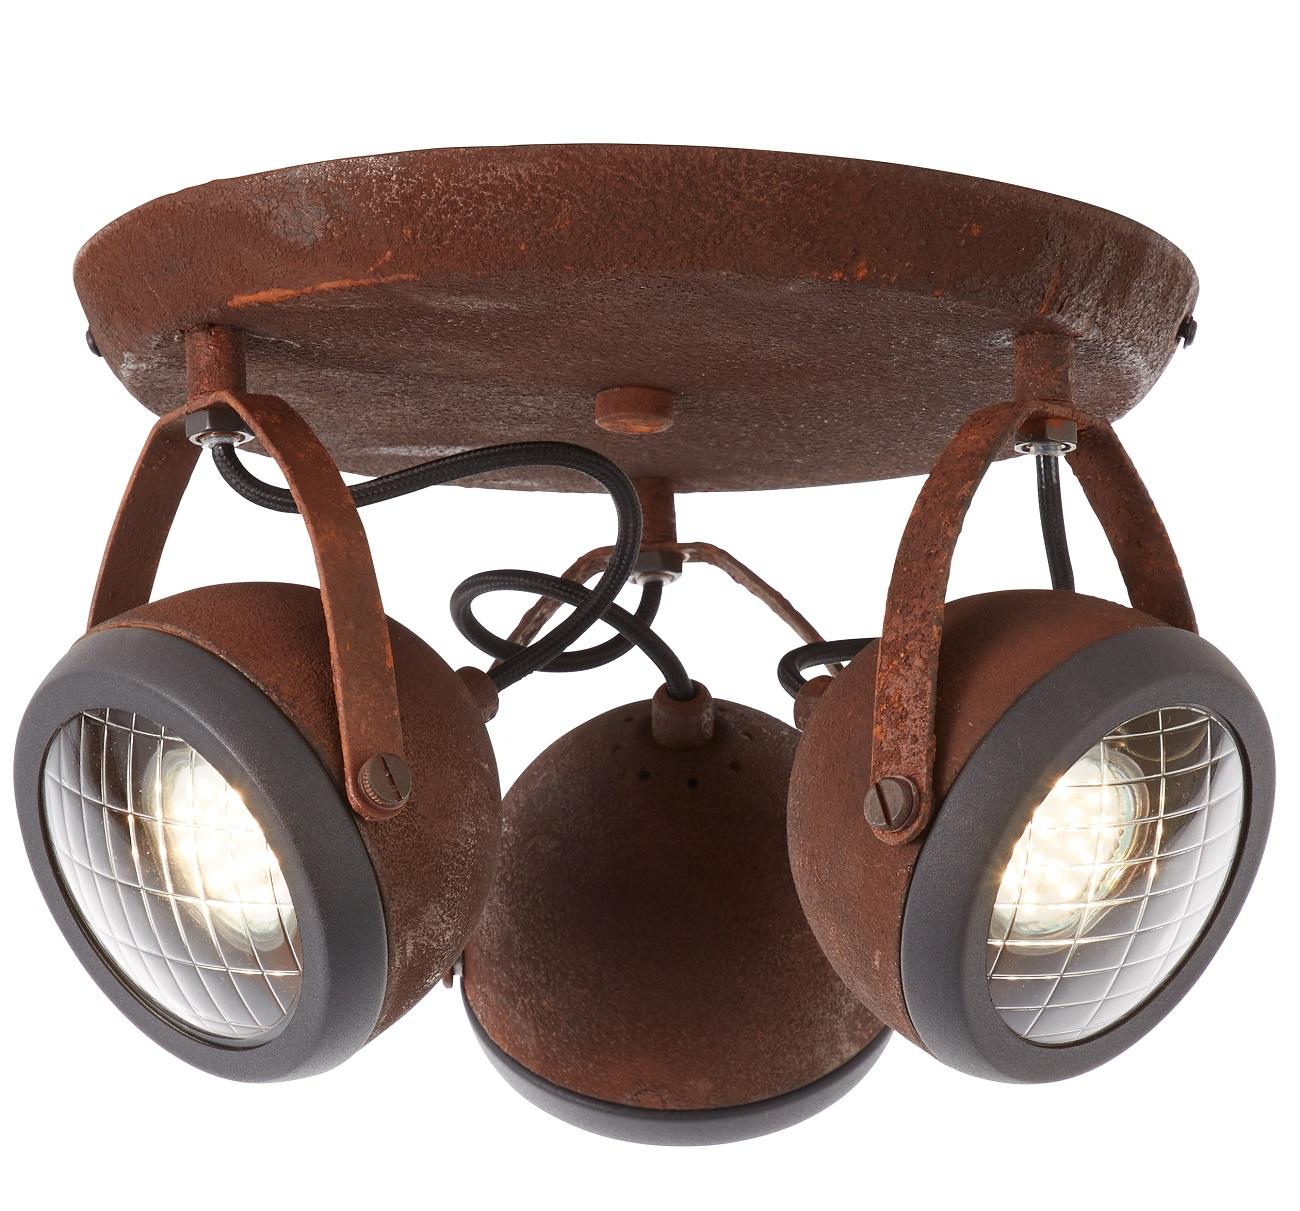 Plafondlamp Relax 3xGU10 max 3x4Watt in roestbruin | Brilliant